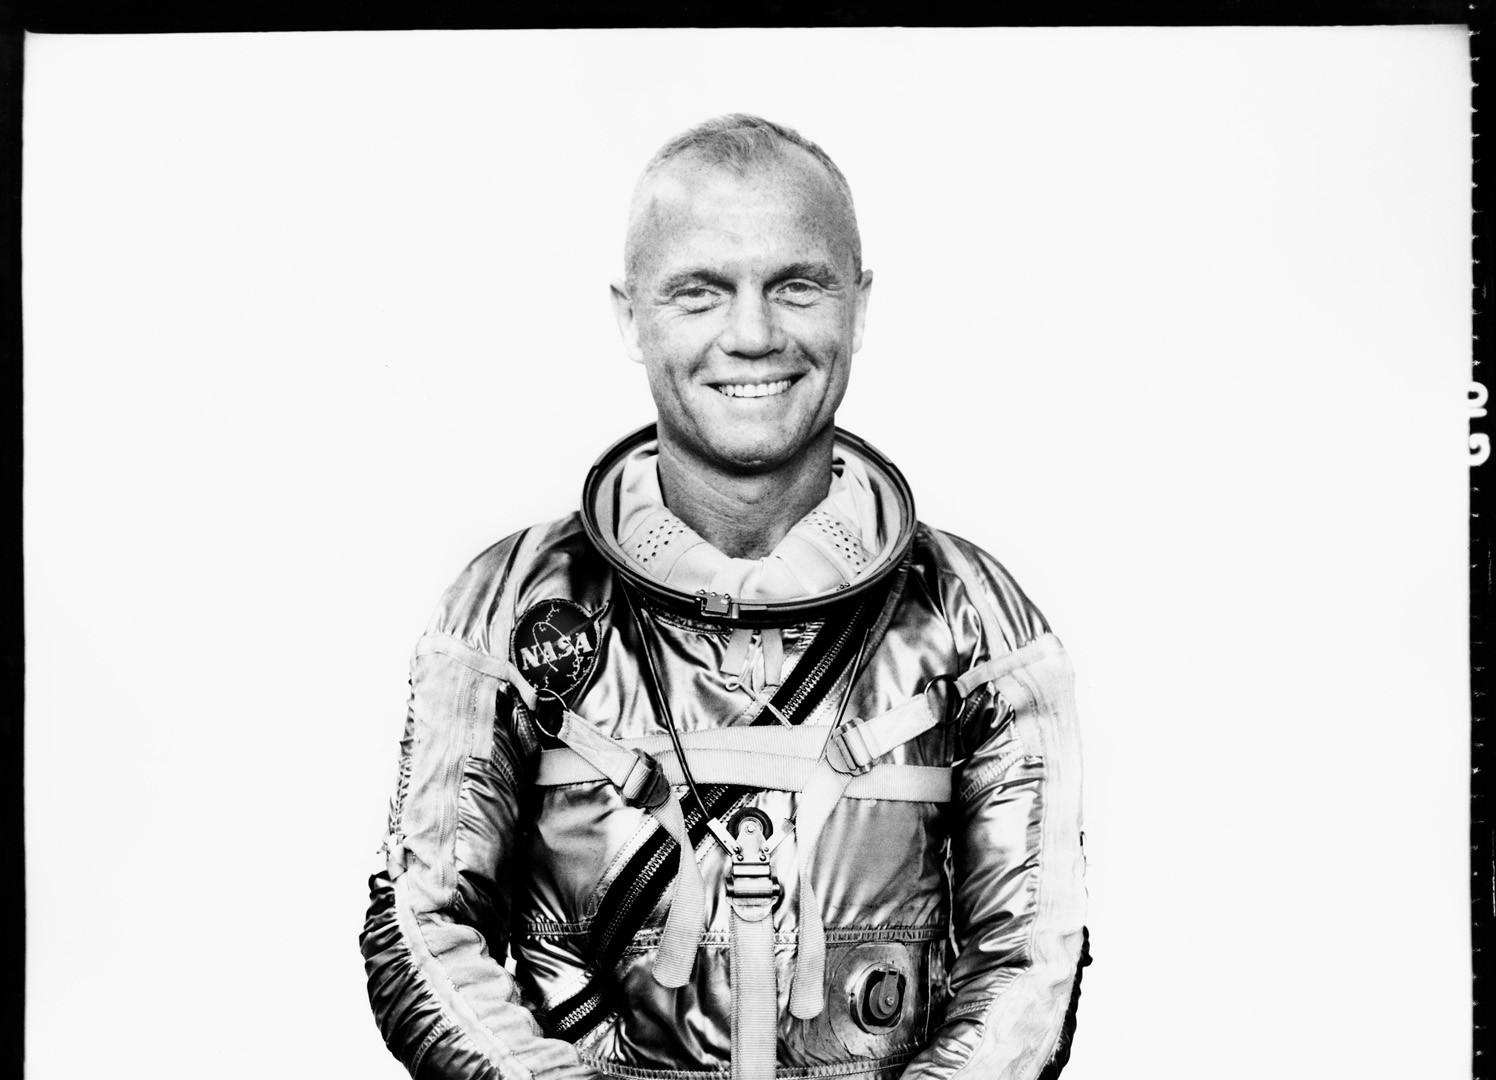 Richard Avedon, John Glenn, Astronaut, Langley Field, Virginia, March 31, 1961